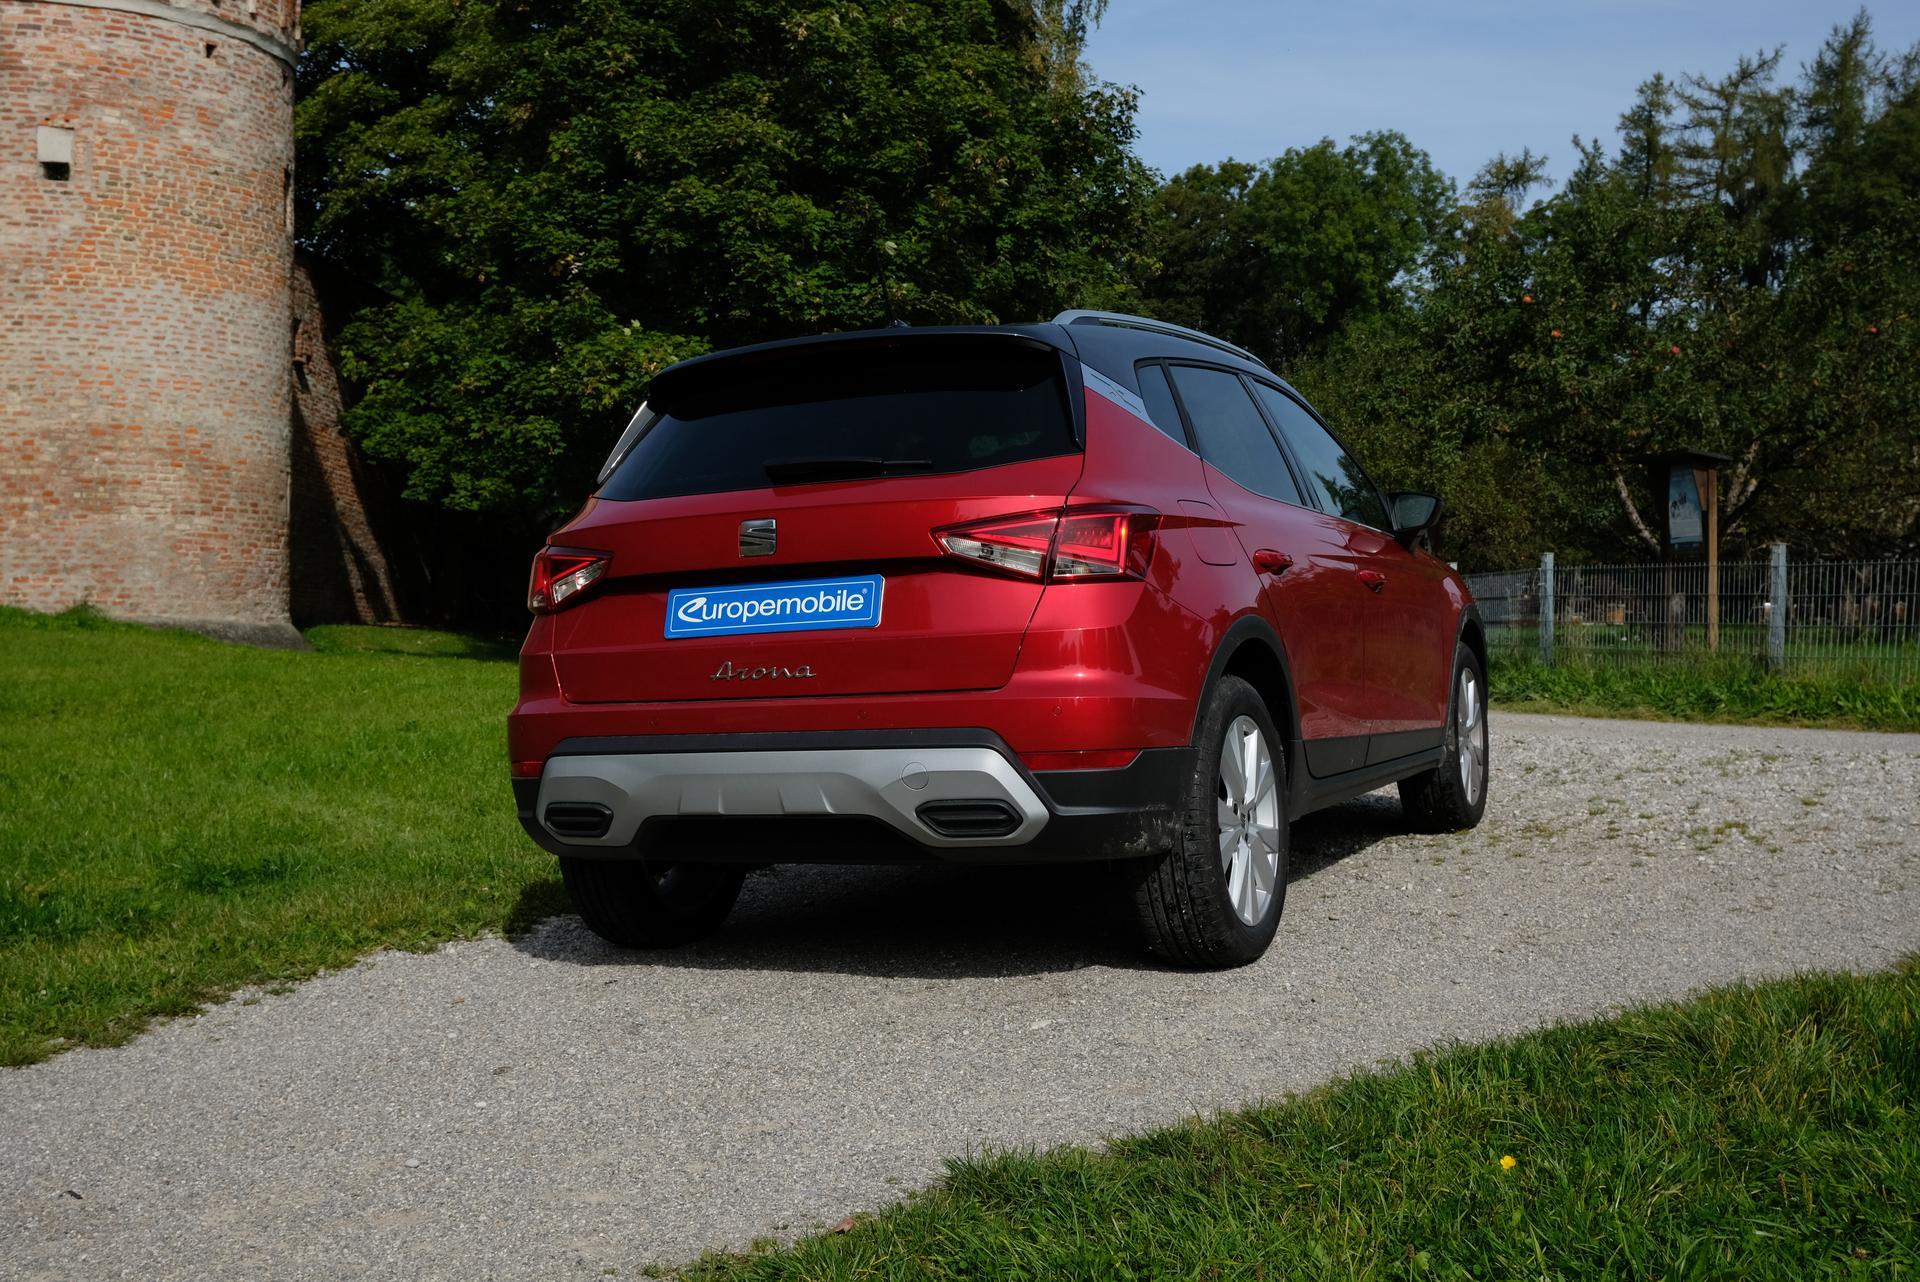 Facelift: SEAT Arona 1.0 TGI. new